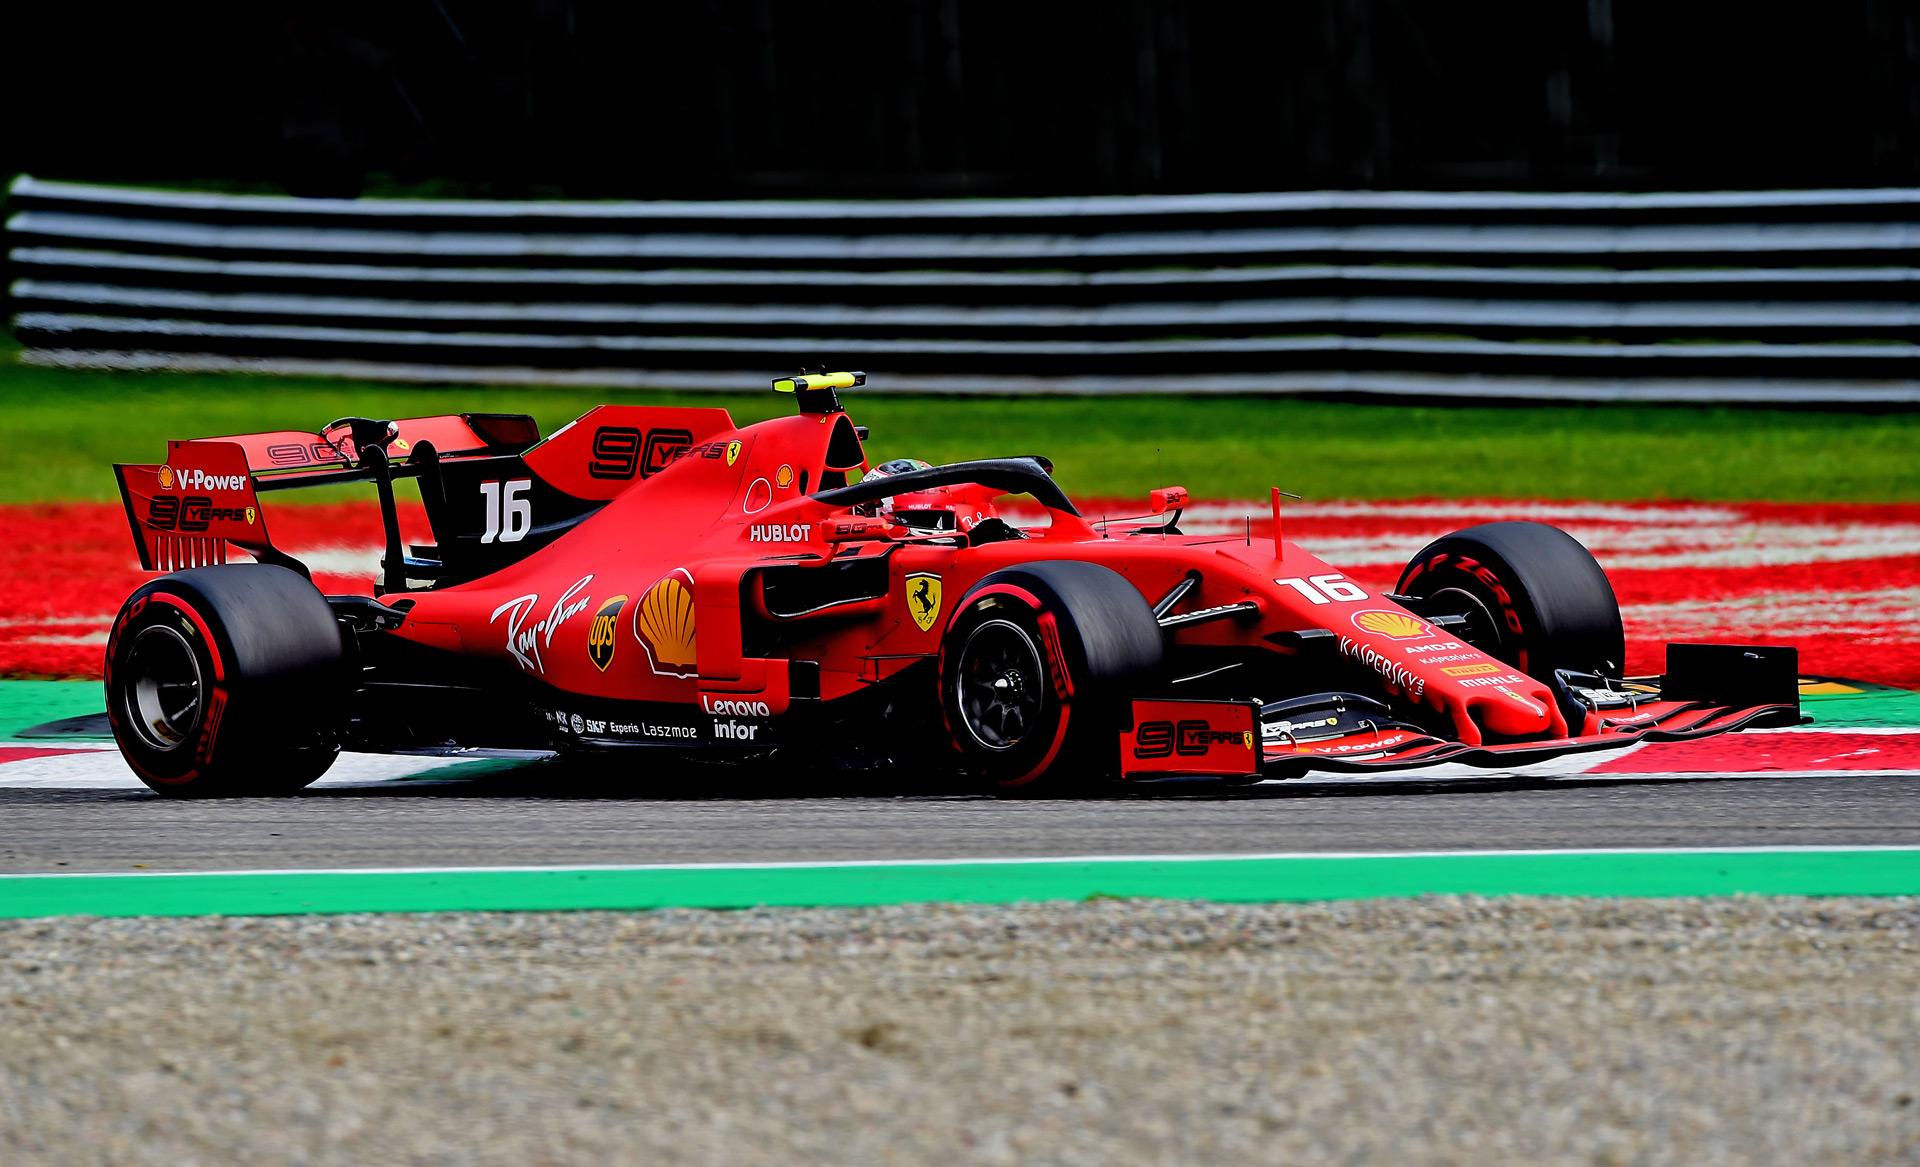 ferrari u0026 39 s leclerc wows home crowd at 2019 formula one italian grand prix